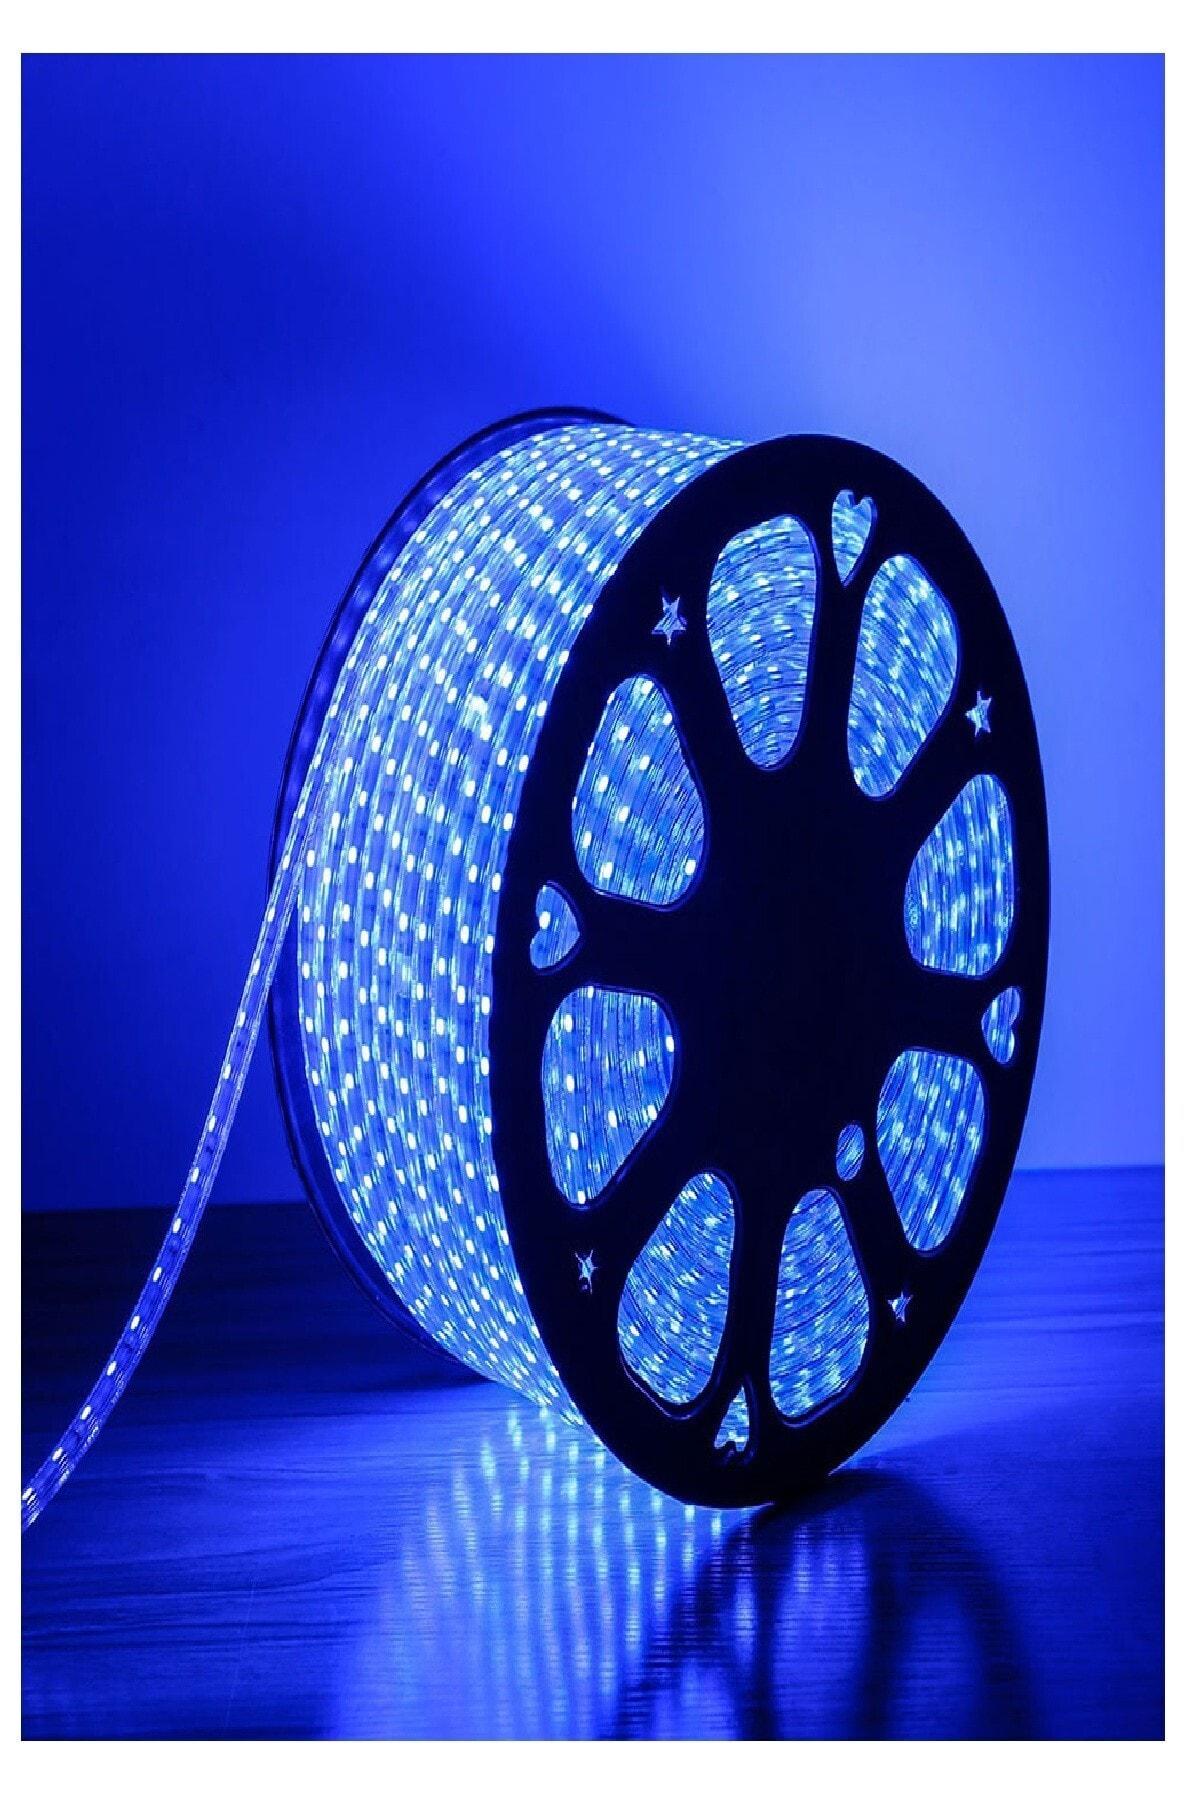 Flexible Strip Hortum Şerit Led Işık - 220 Volt Enerji Fişli - Mavi - 2 Metre